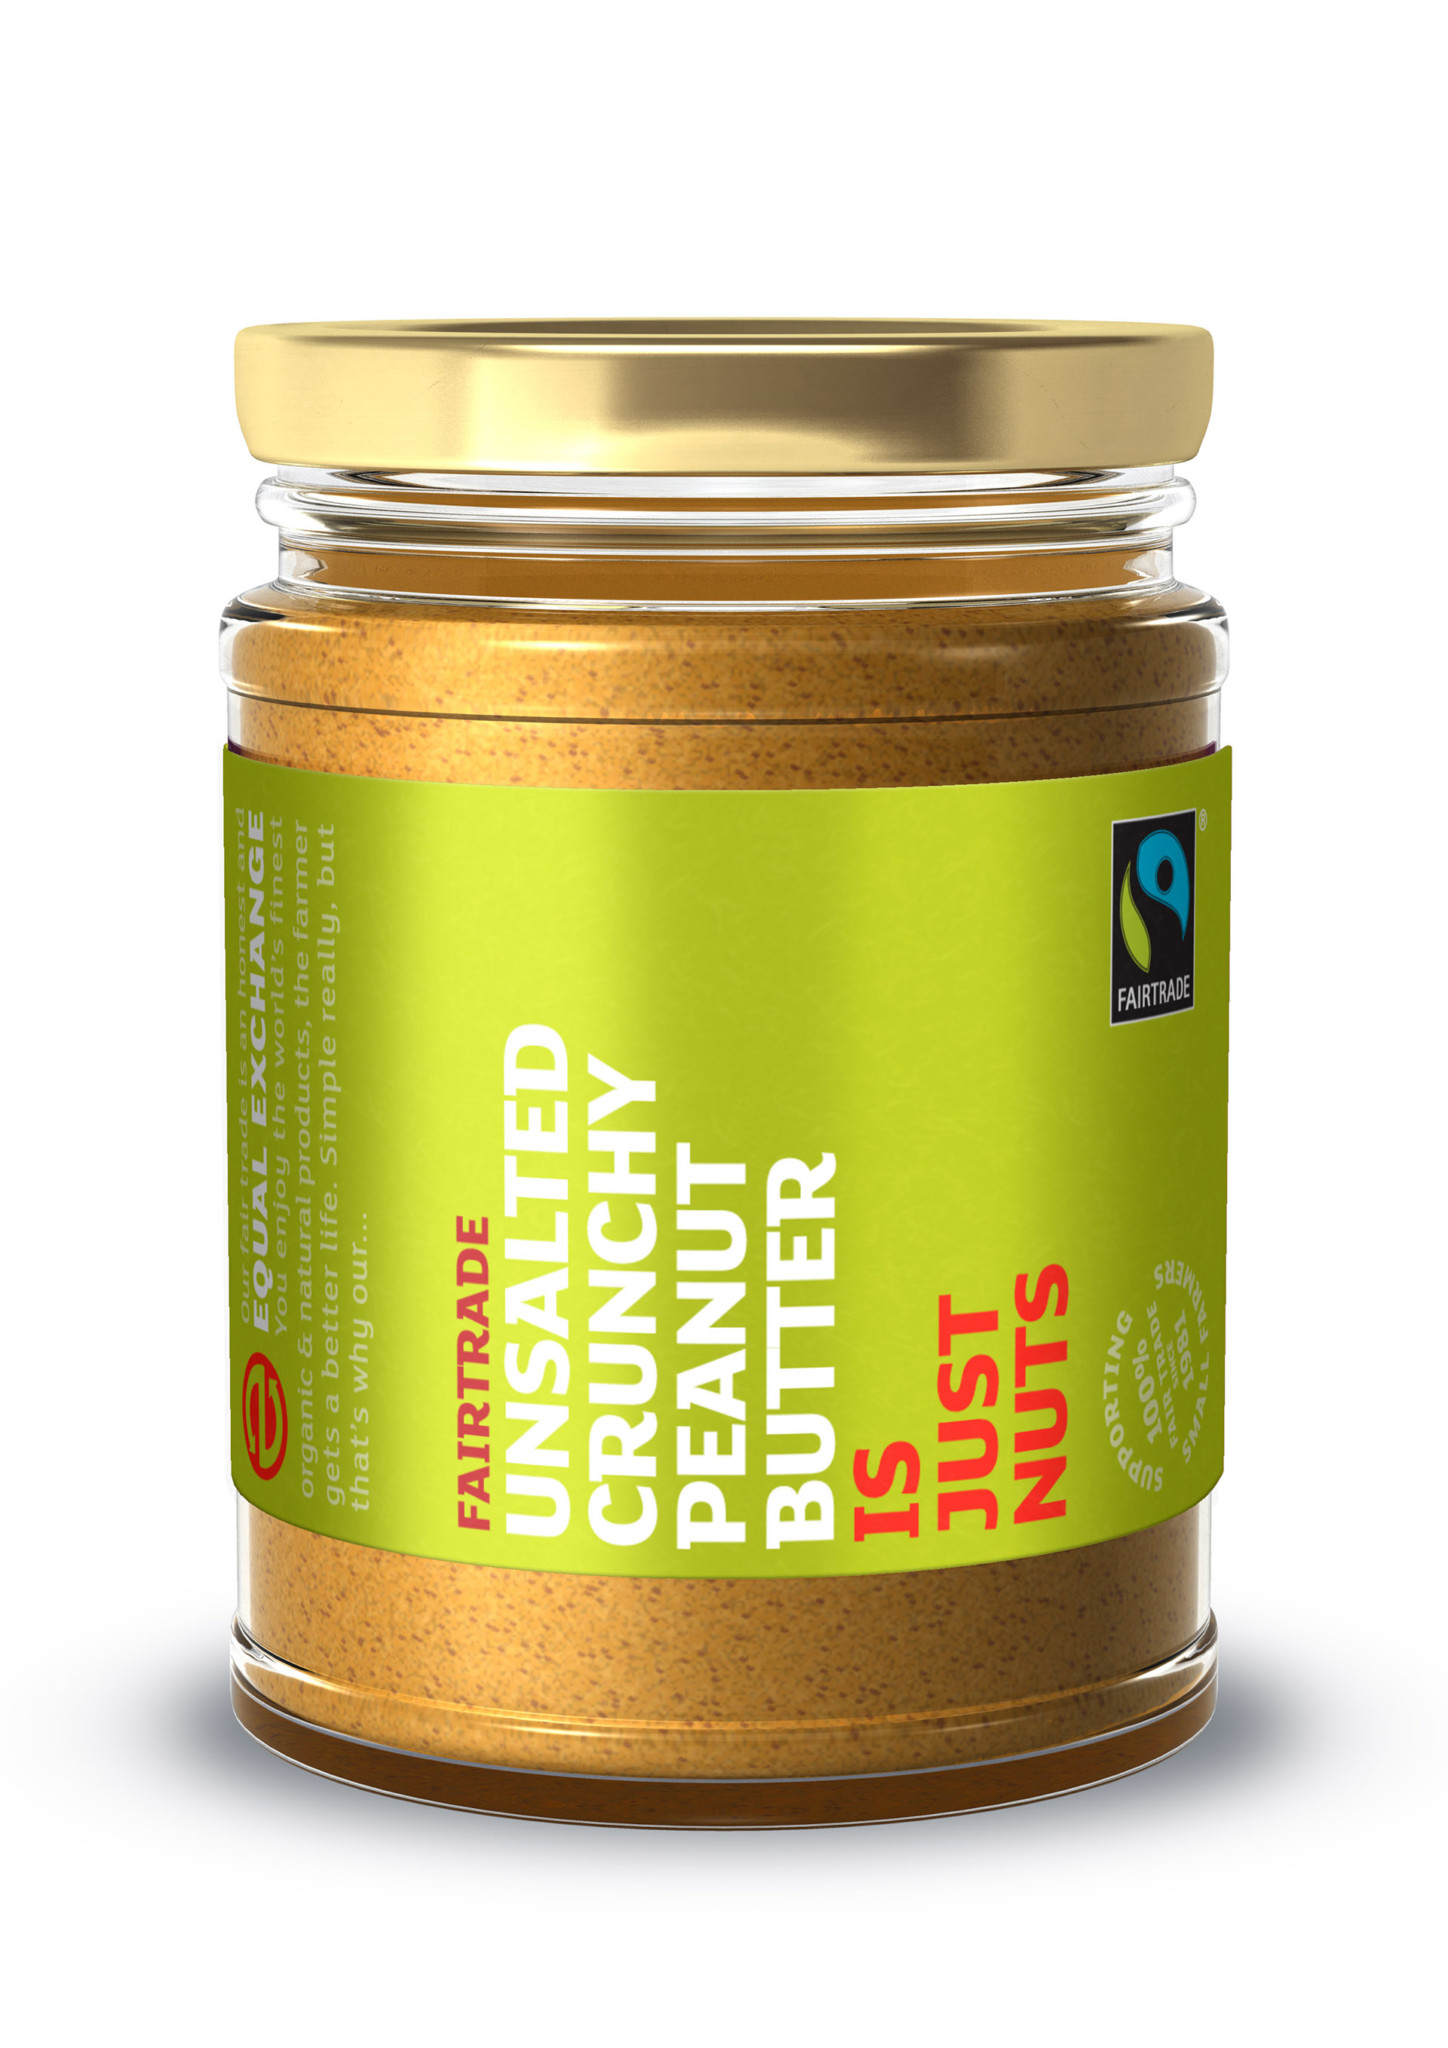 3D Fairtrade Food Unsalted Crunchy Peanut Butter Glass Jar Product Illustration